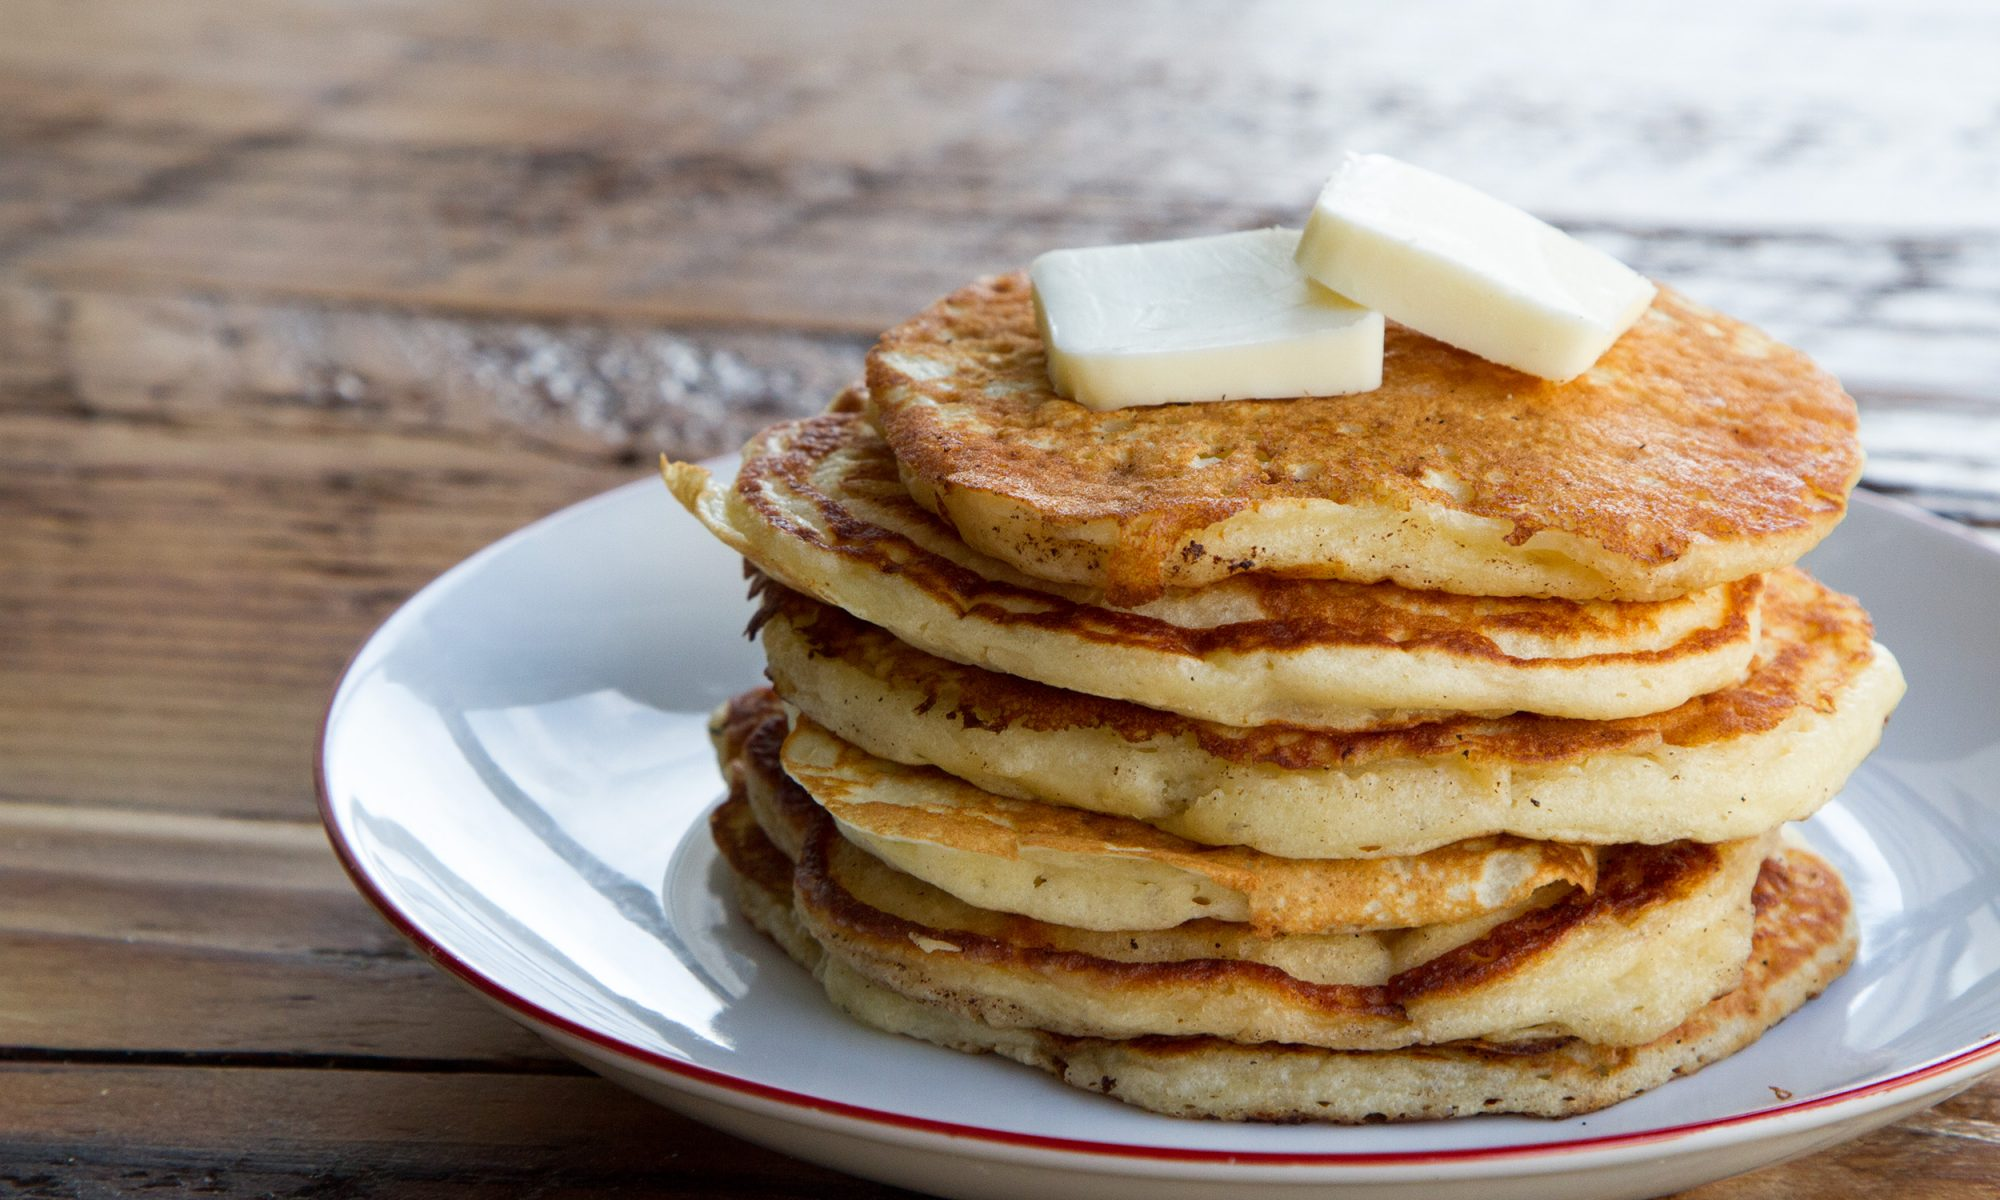 EC: Make Extra-Golden-Brown Pancakes with This Secret Ingredient